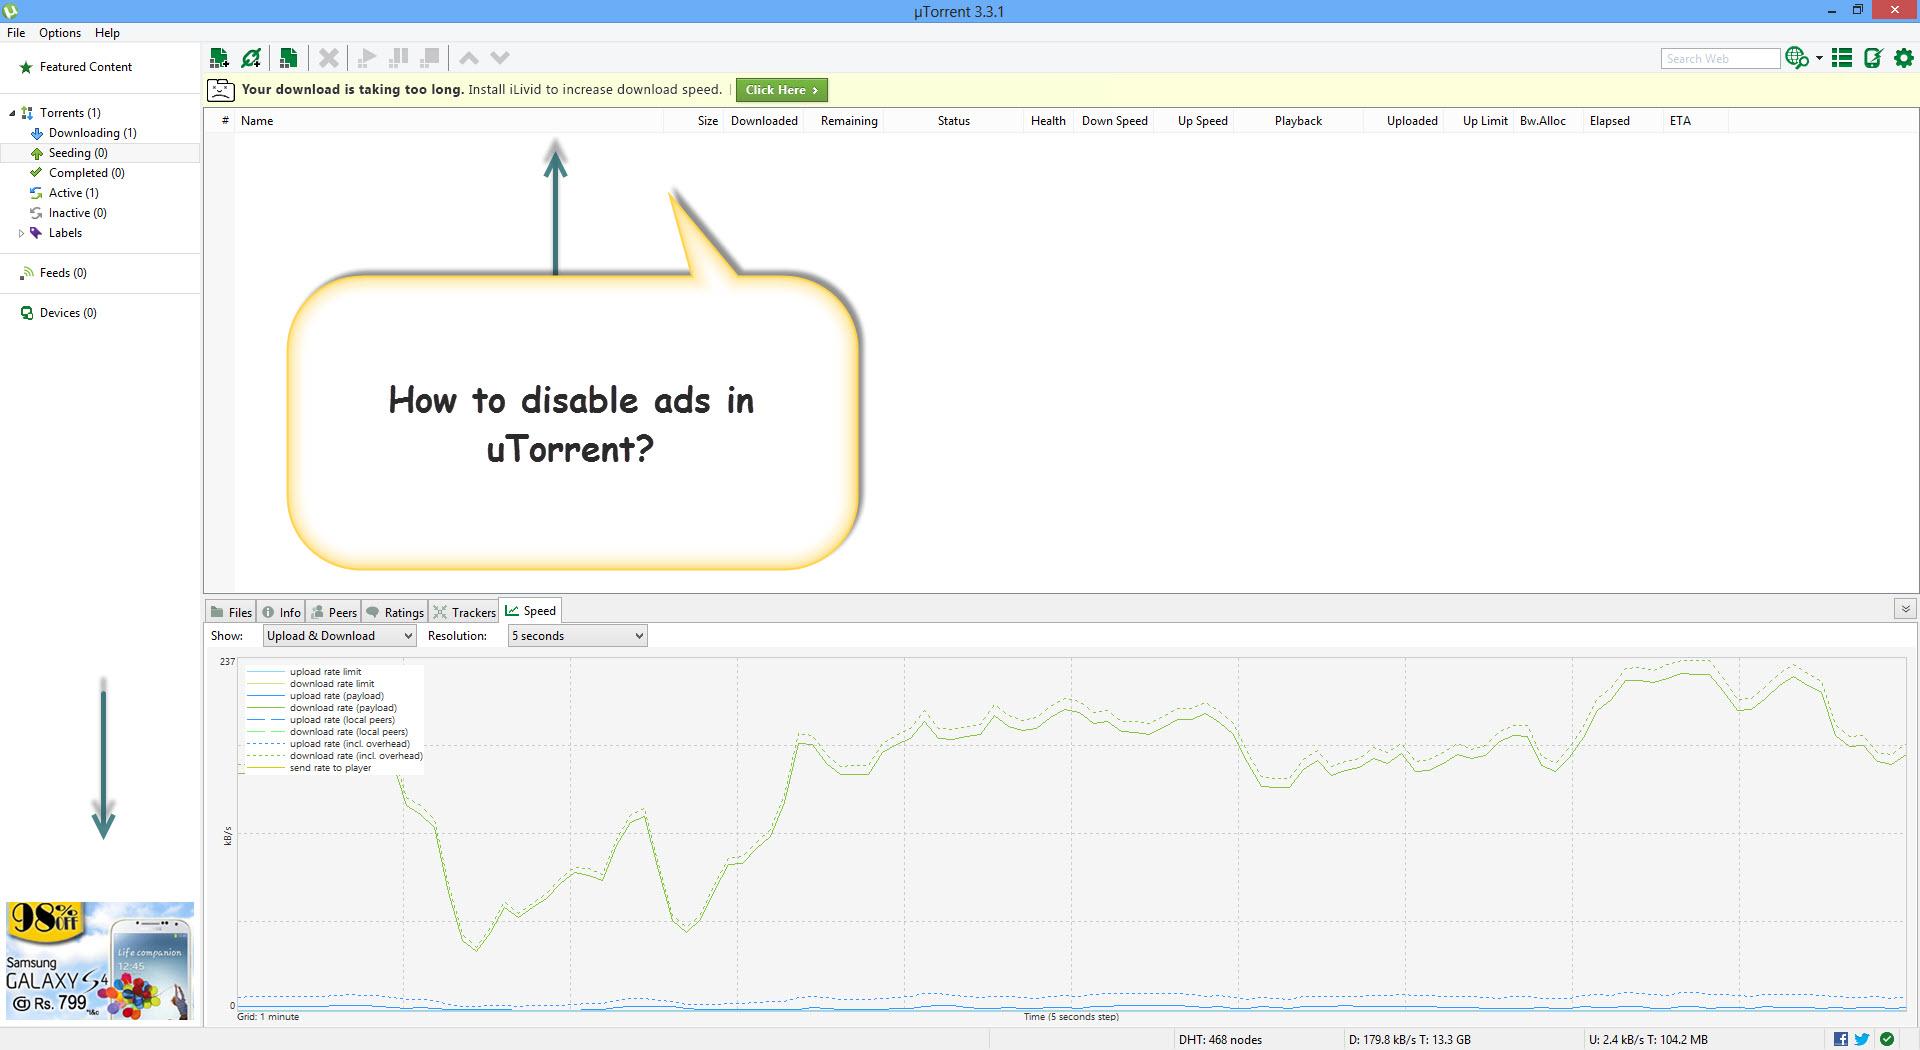 How To Block Ads In uTorrent